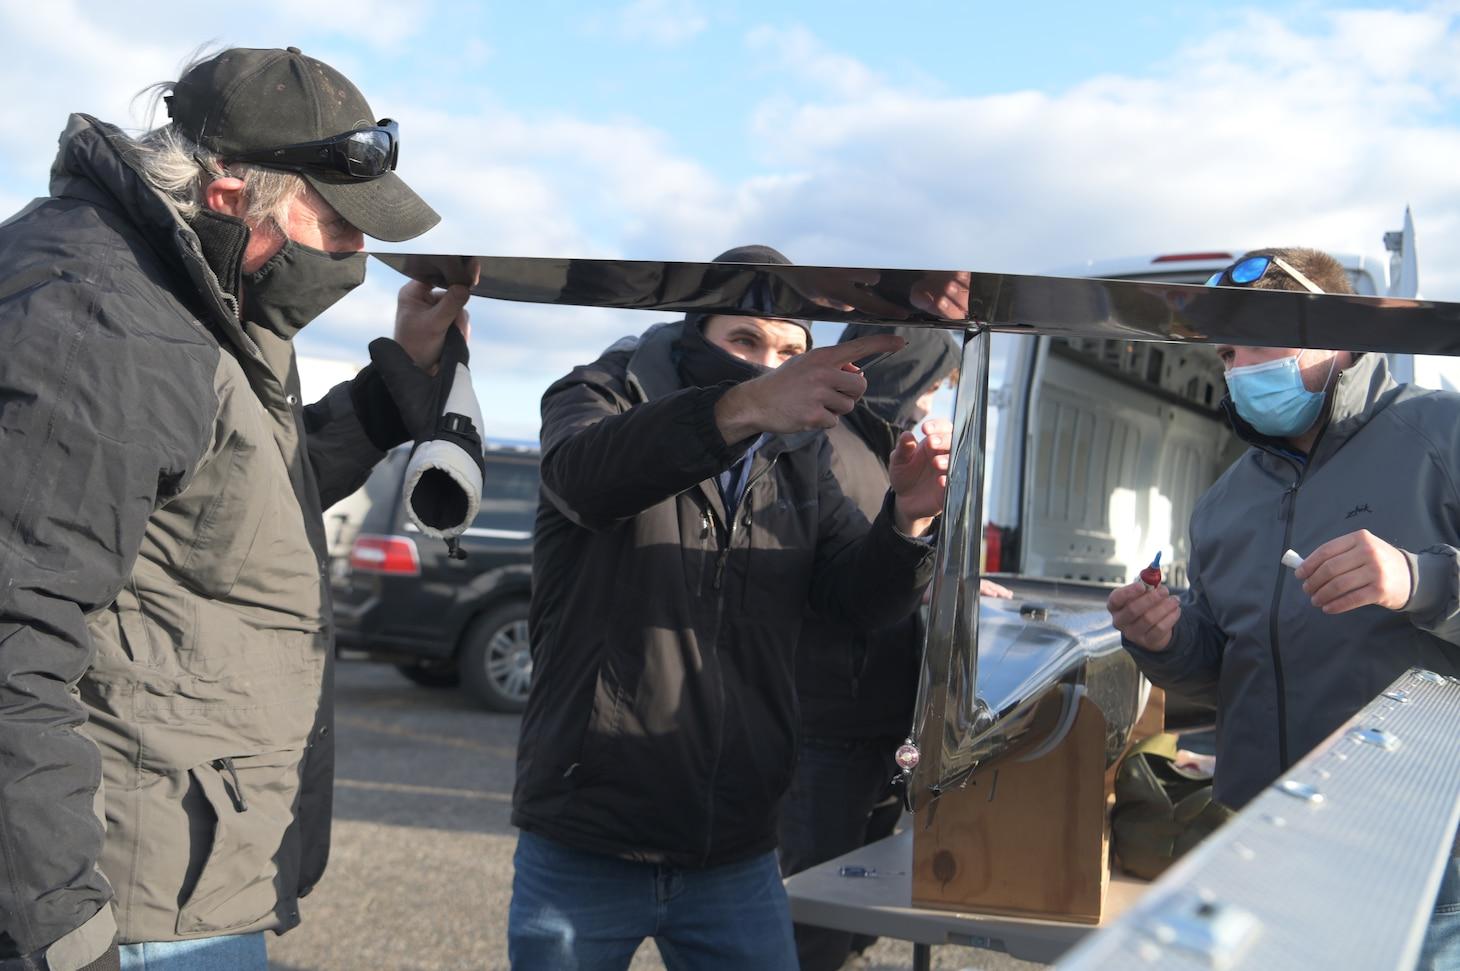 NRL's Hybrid Tiger UAV Soars at Demonstration